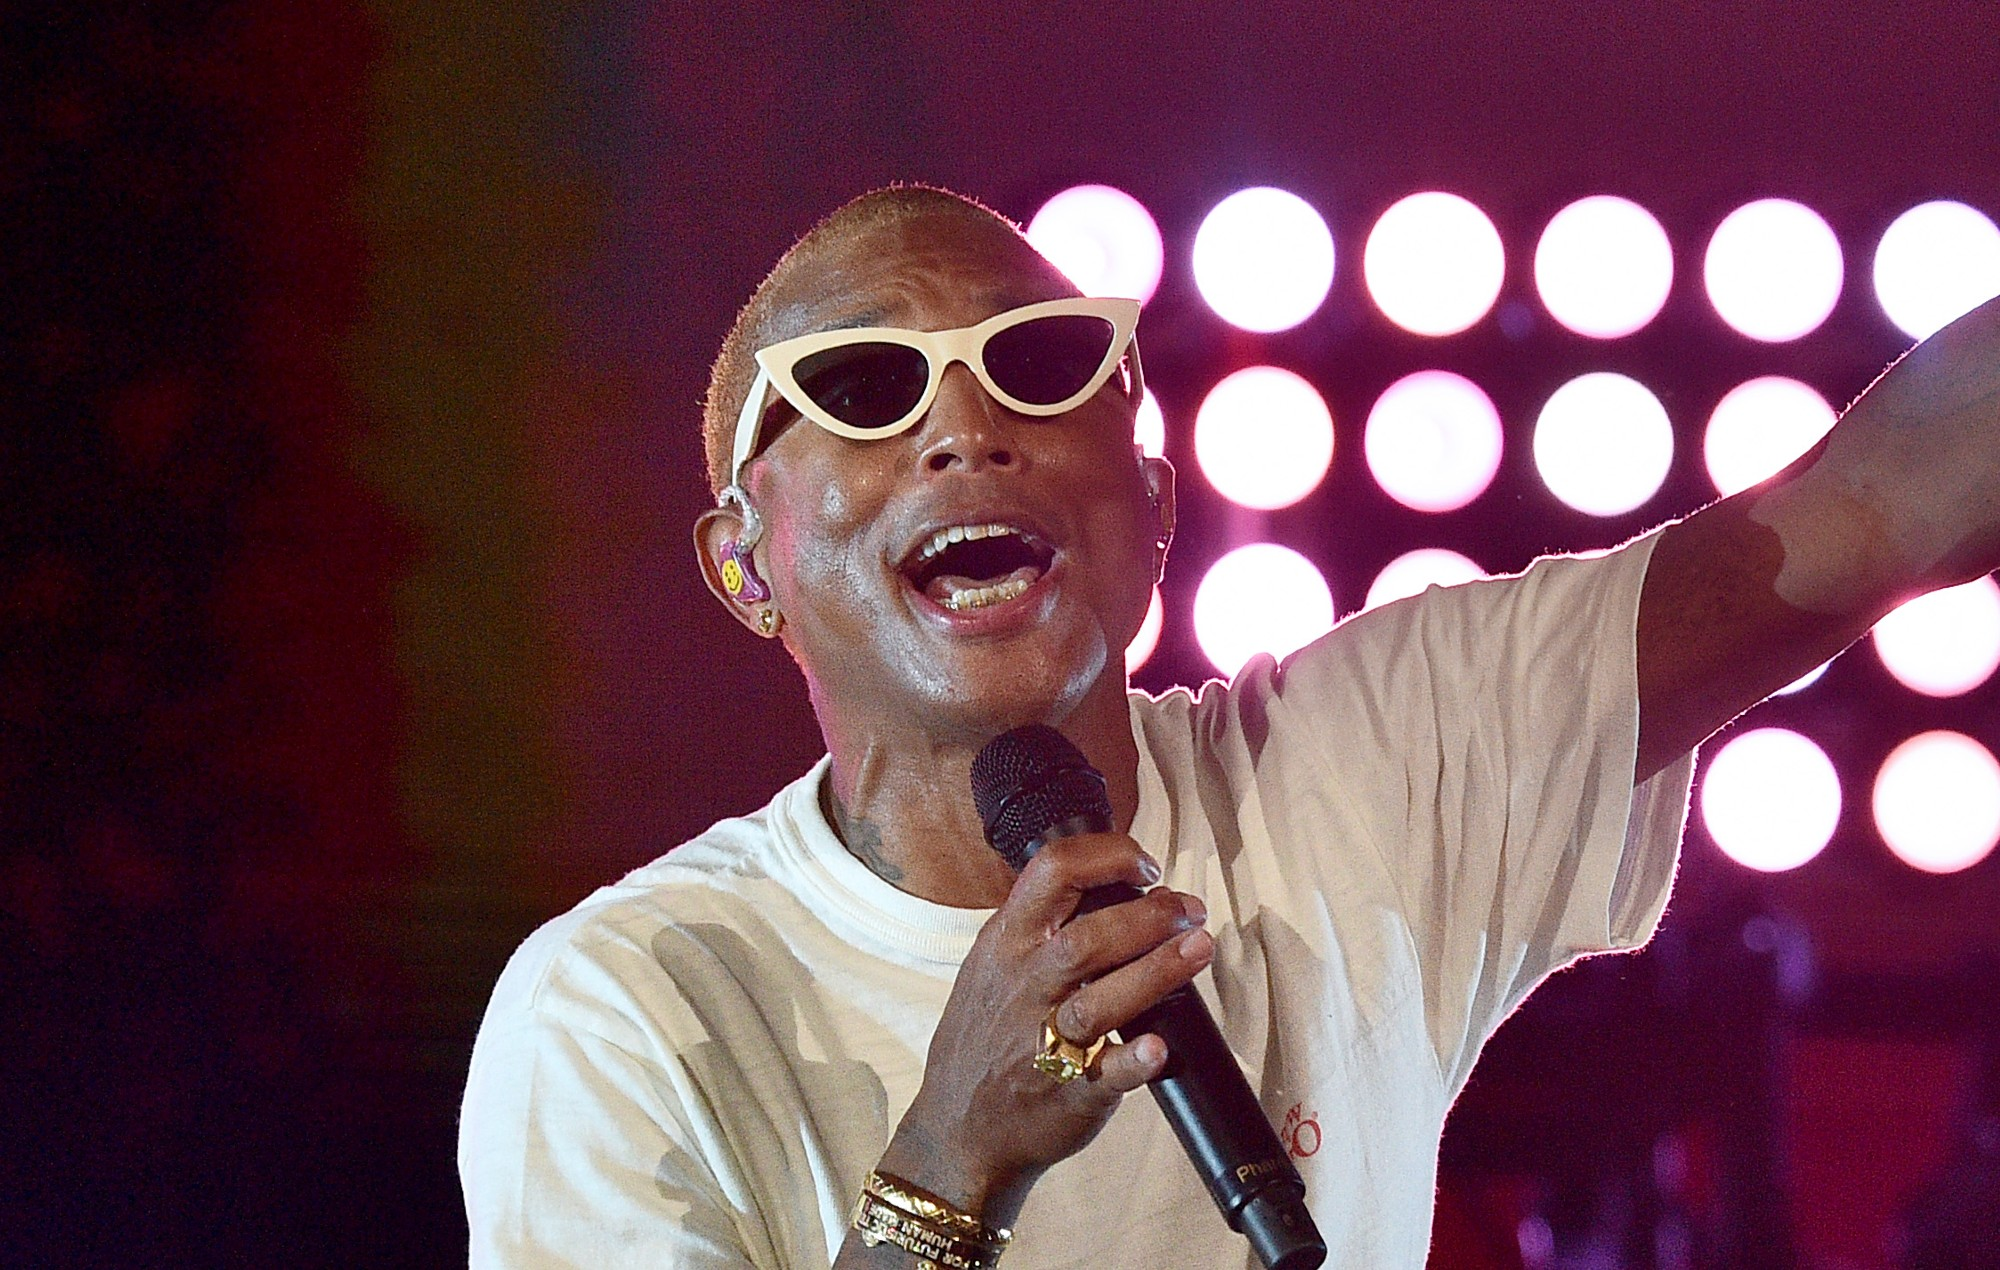 pharrell williams blurred lines perjury case